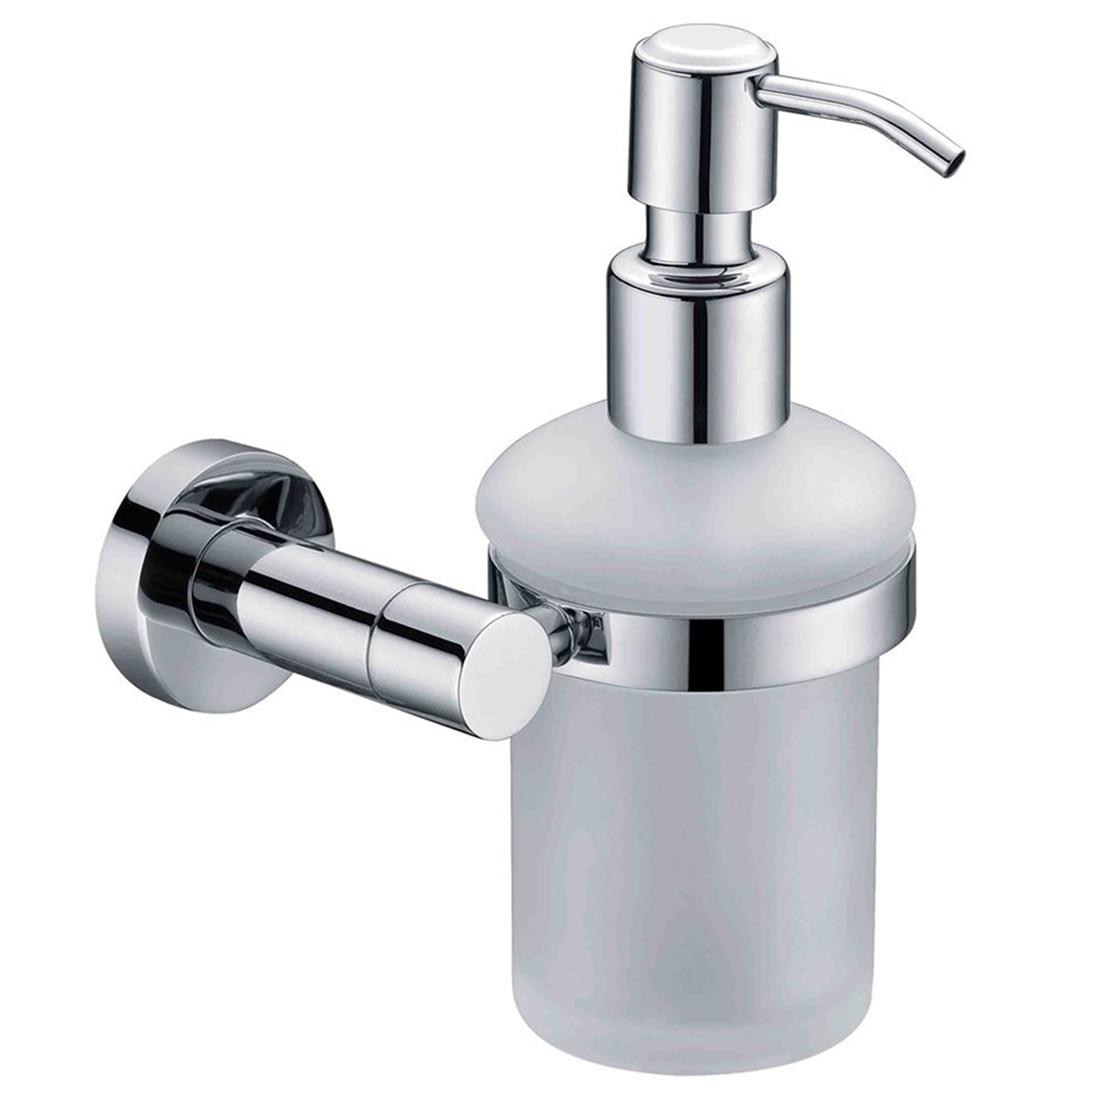 Chrome Plated Brass Wall Mounted Bottle Liquid Soap Dispensers Soap Dish Chromed Brass Hand Soap Dispenser For Kitchen Bathroom цены онлайн